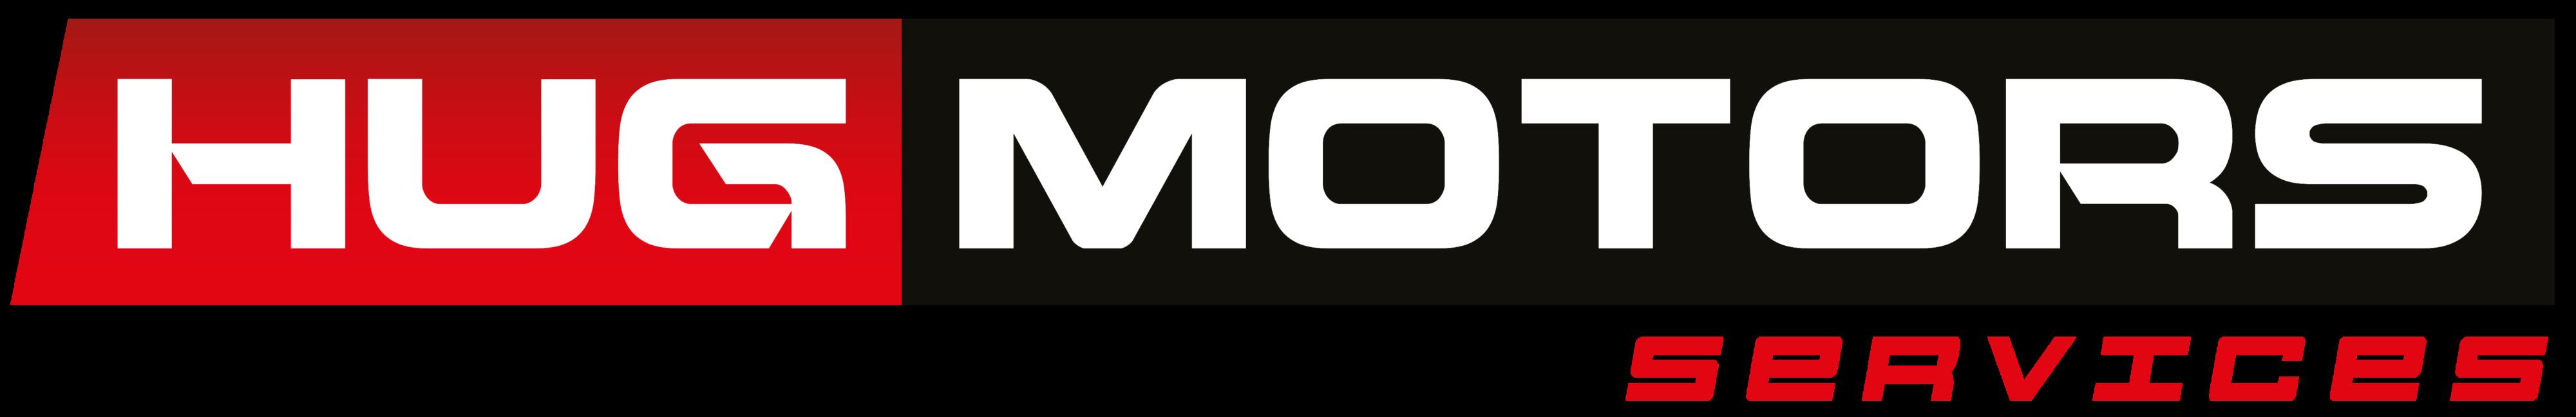 Hug Motors Services